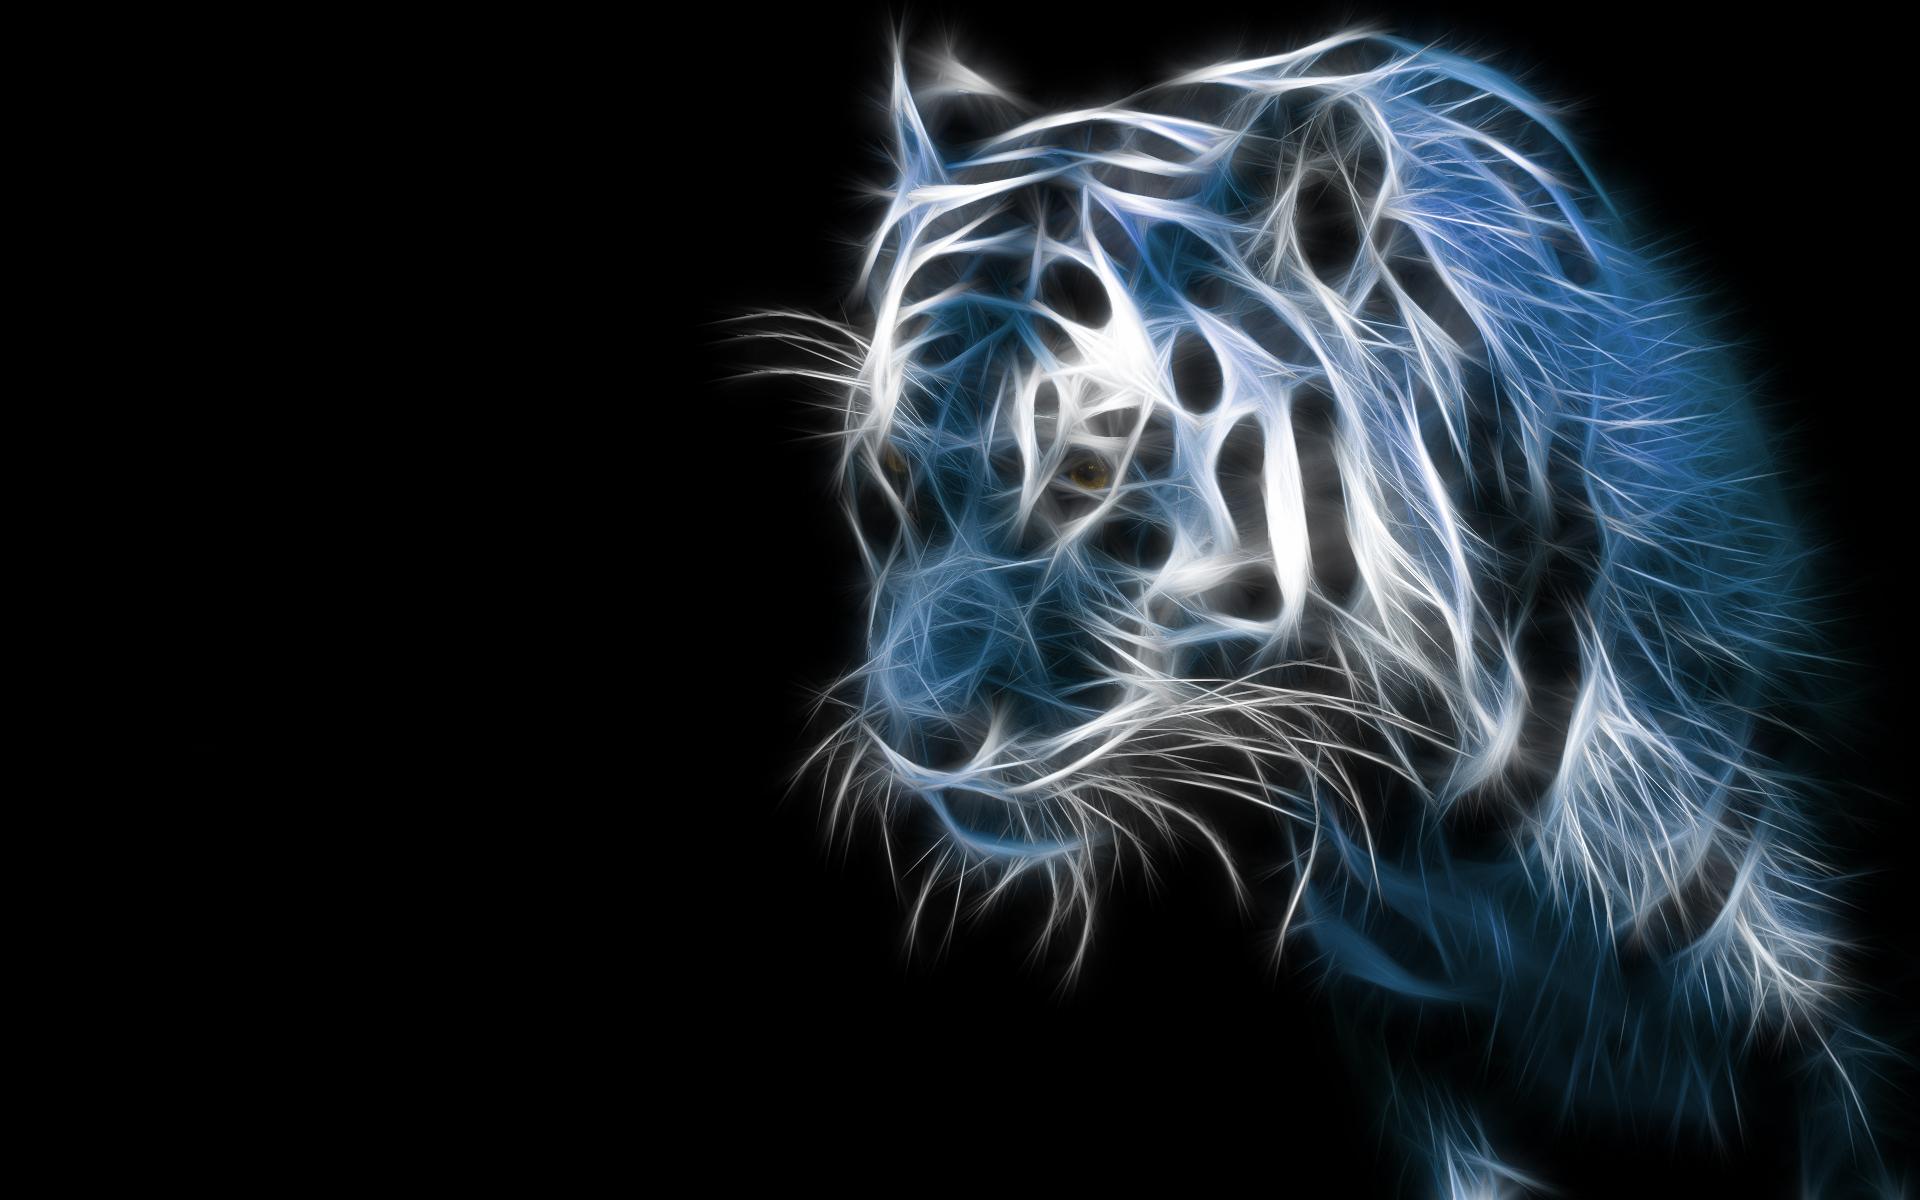 Animalia - Artístico  - Tigre - Fractal - Azul Fondo de Pantalla